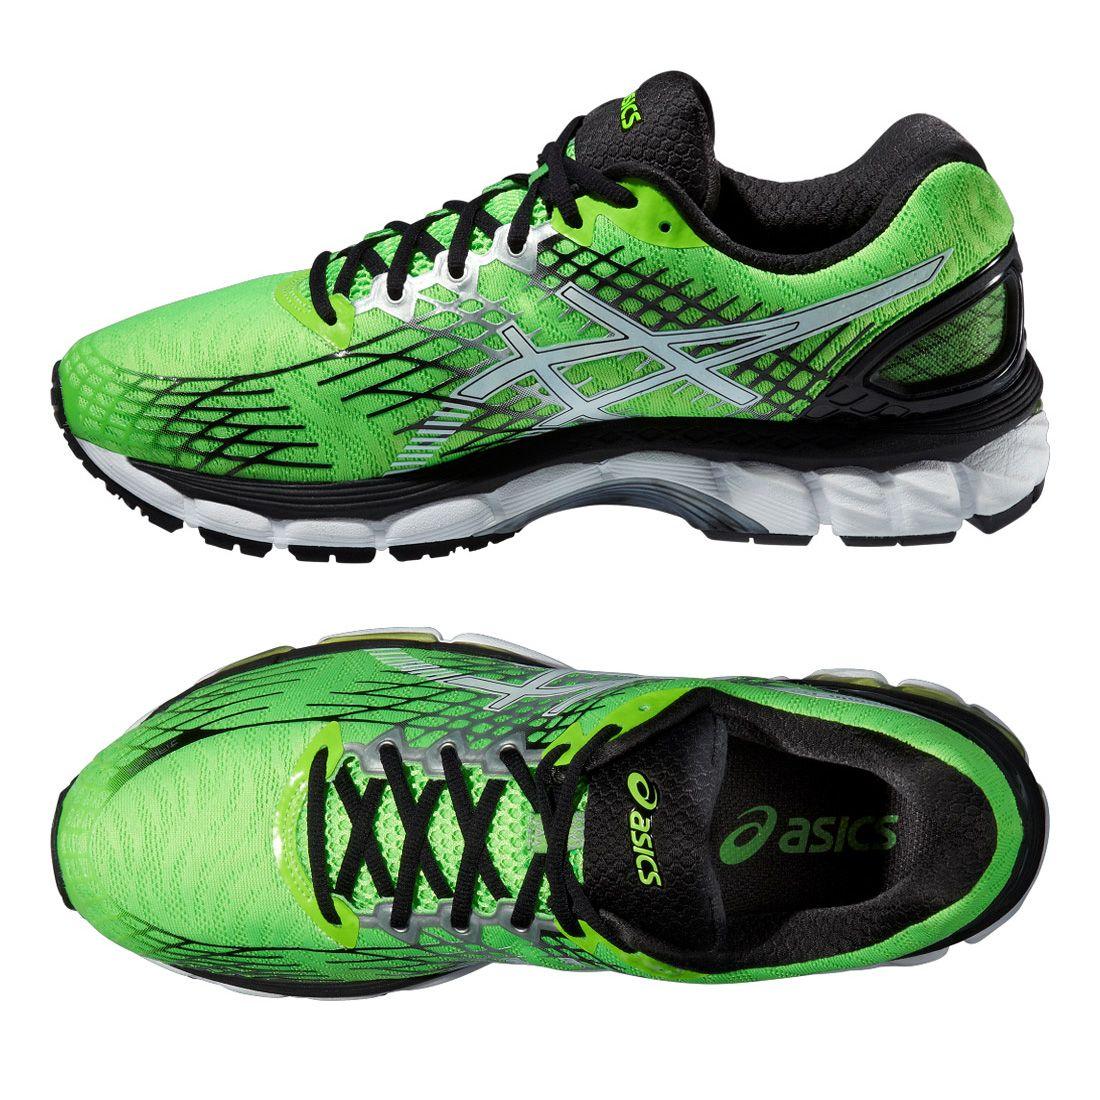 asics gel nimbus 17 mens running shoes aw15 sweatband